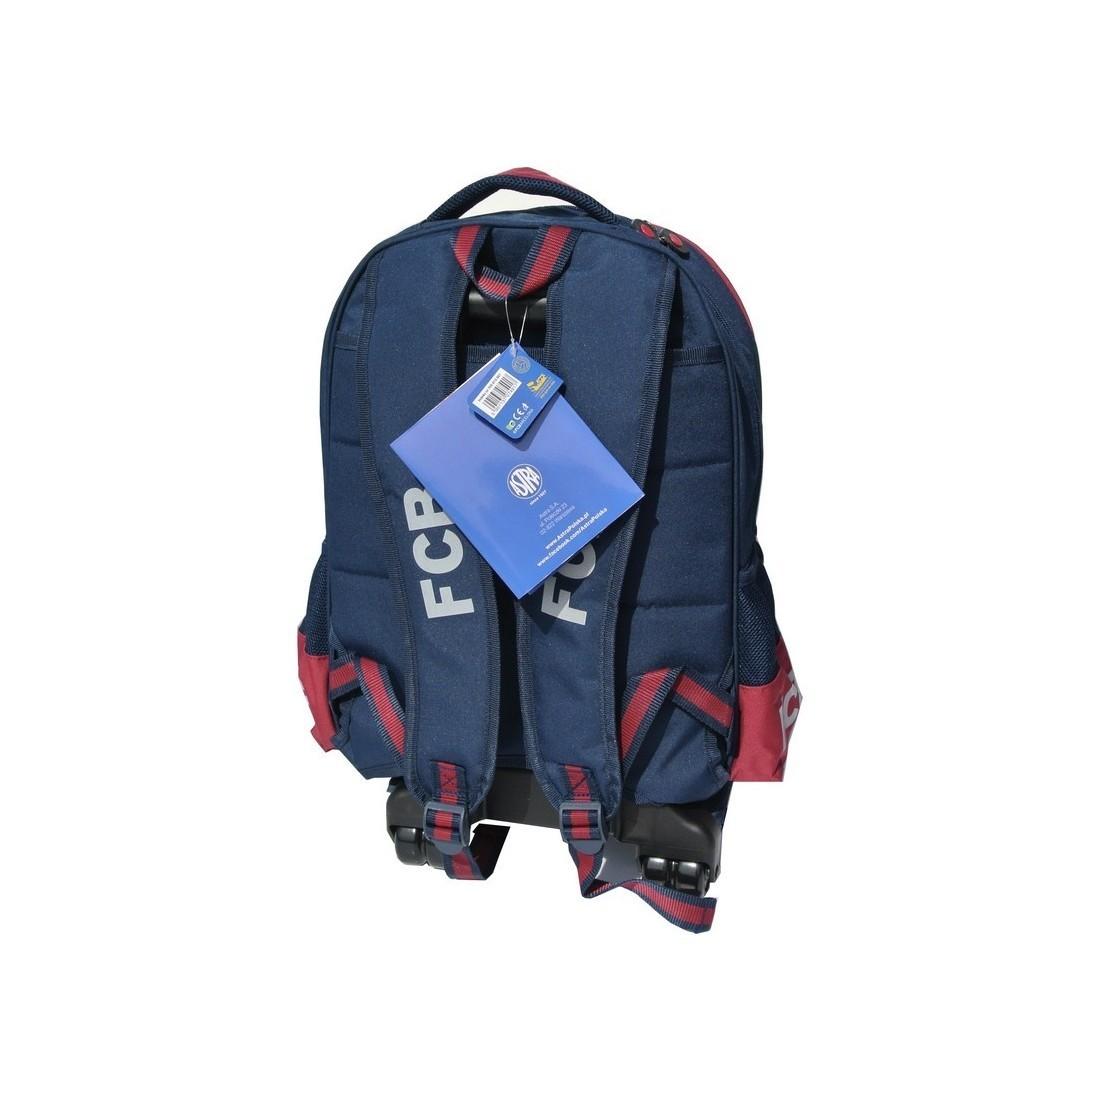 Plecak na kółkach FC Barcelona - plecak-tornister.pl